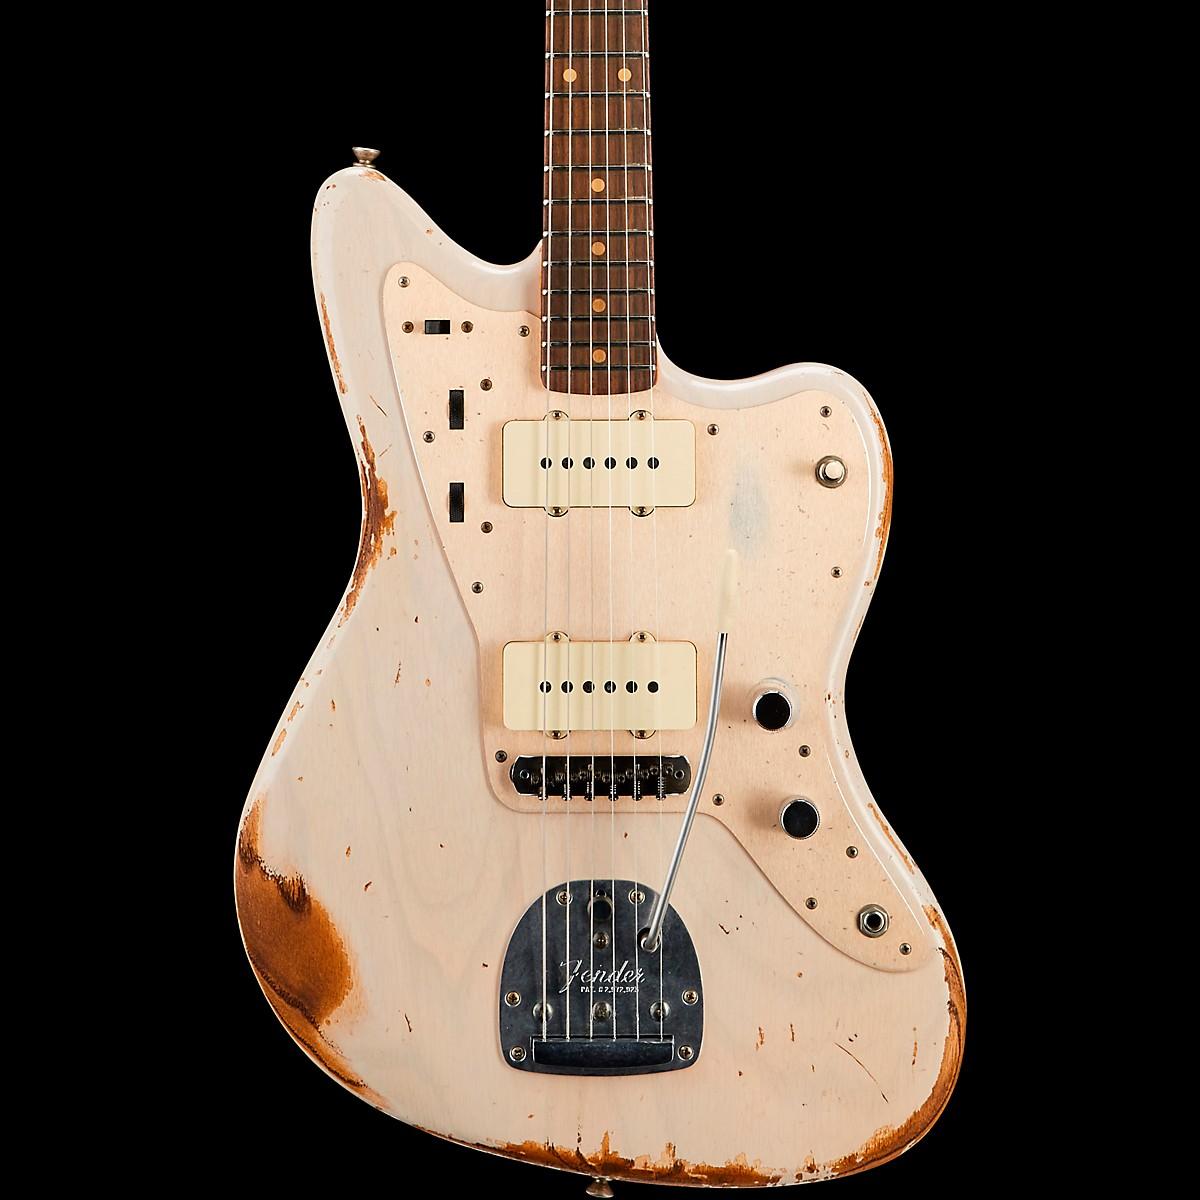 Fender Custom Shop 1959 Jazzmaster Heavy Relic Electric Guitar